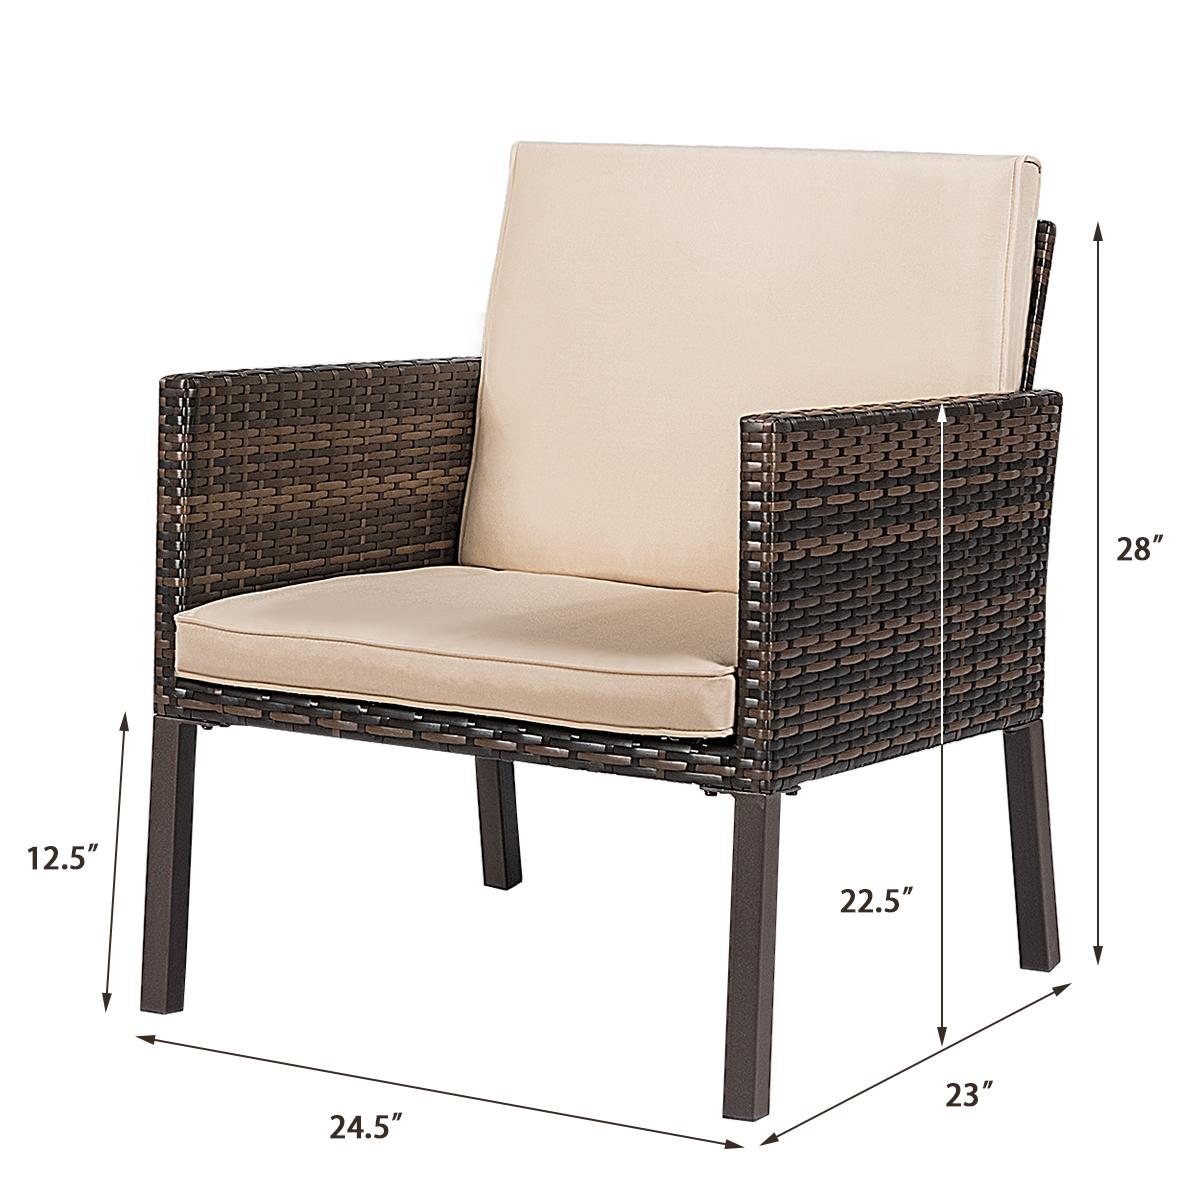 5 pcs Rattan Patio  Ottoman Cushioned Garden Furniture Set Chairs